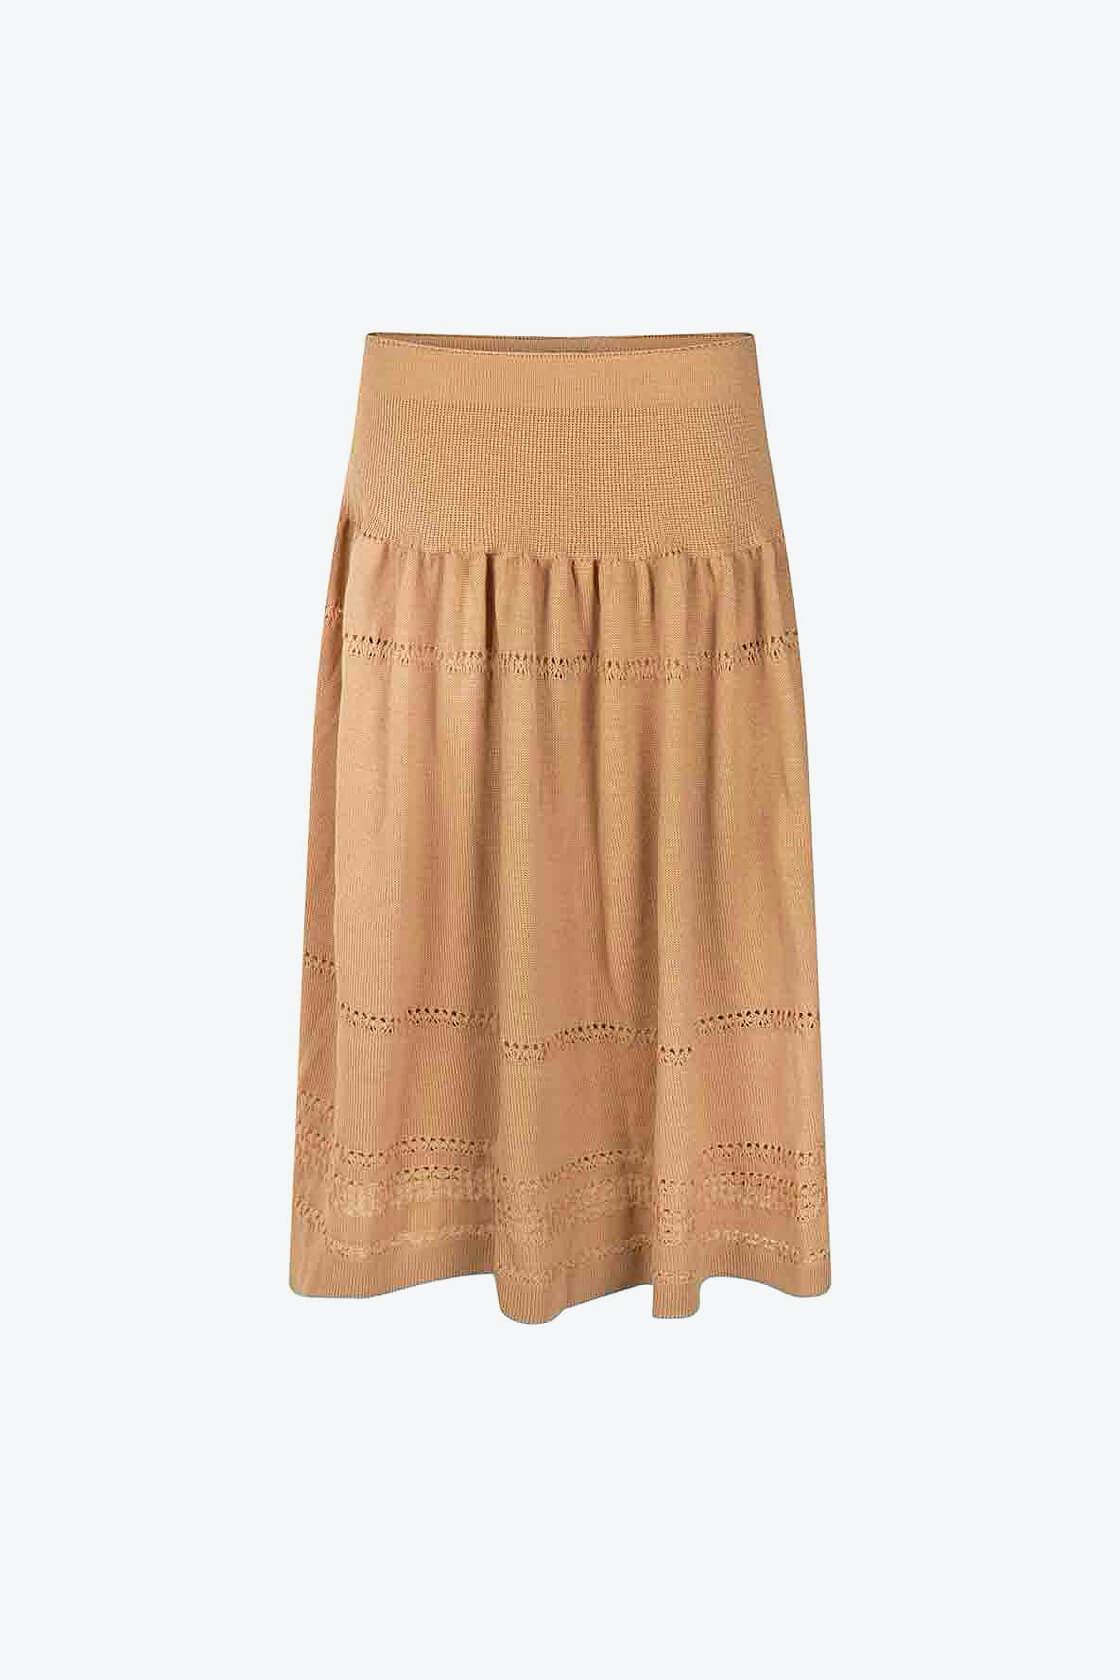 Calf Length Bohemian Chic Knitted Skirt Sweety Beige